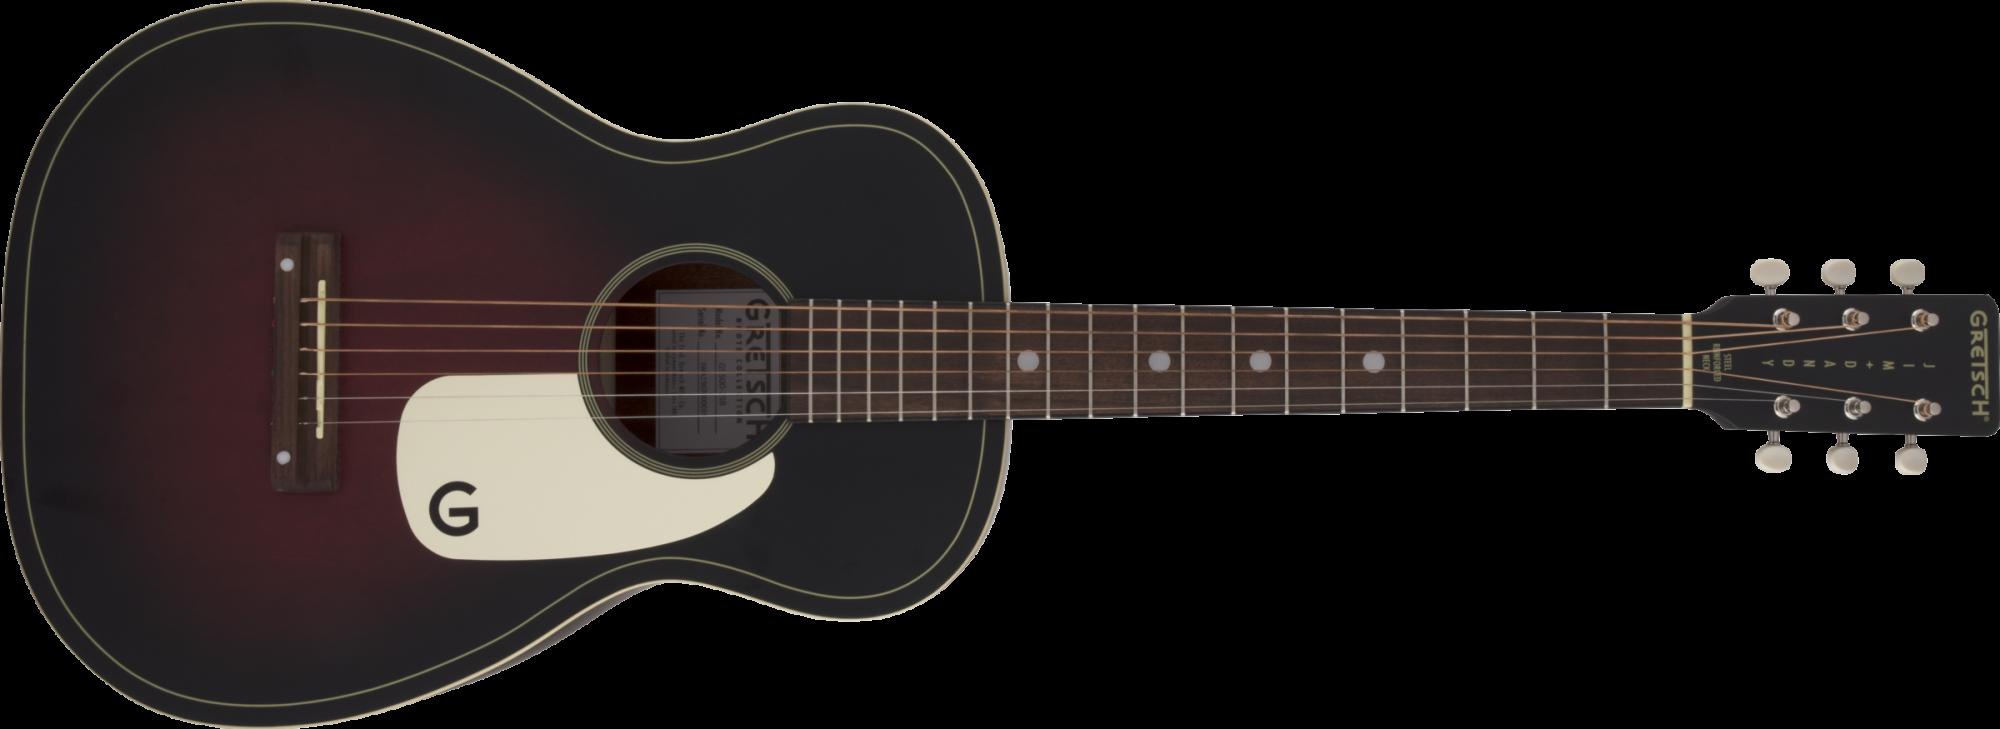 Gretsch G9500 Jim Dandy 24 Scale Flat Top Guitar, 2-Color Sunburst